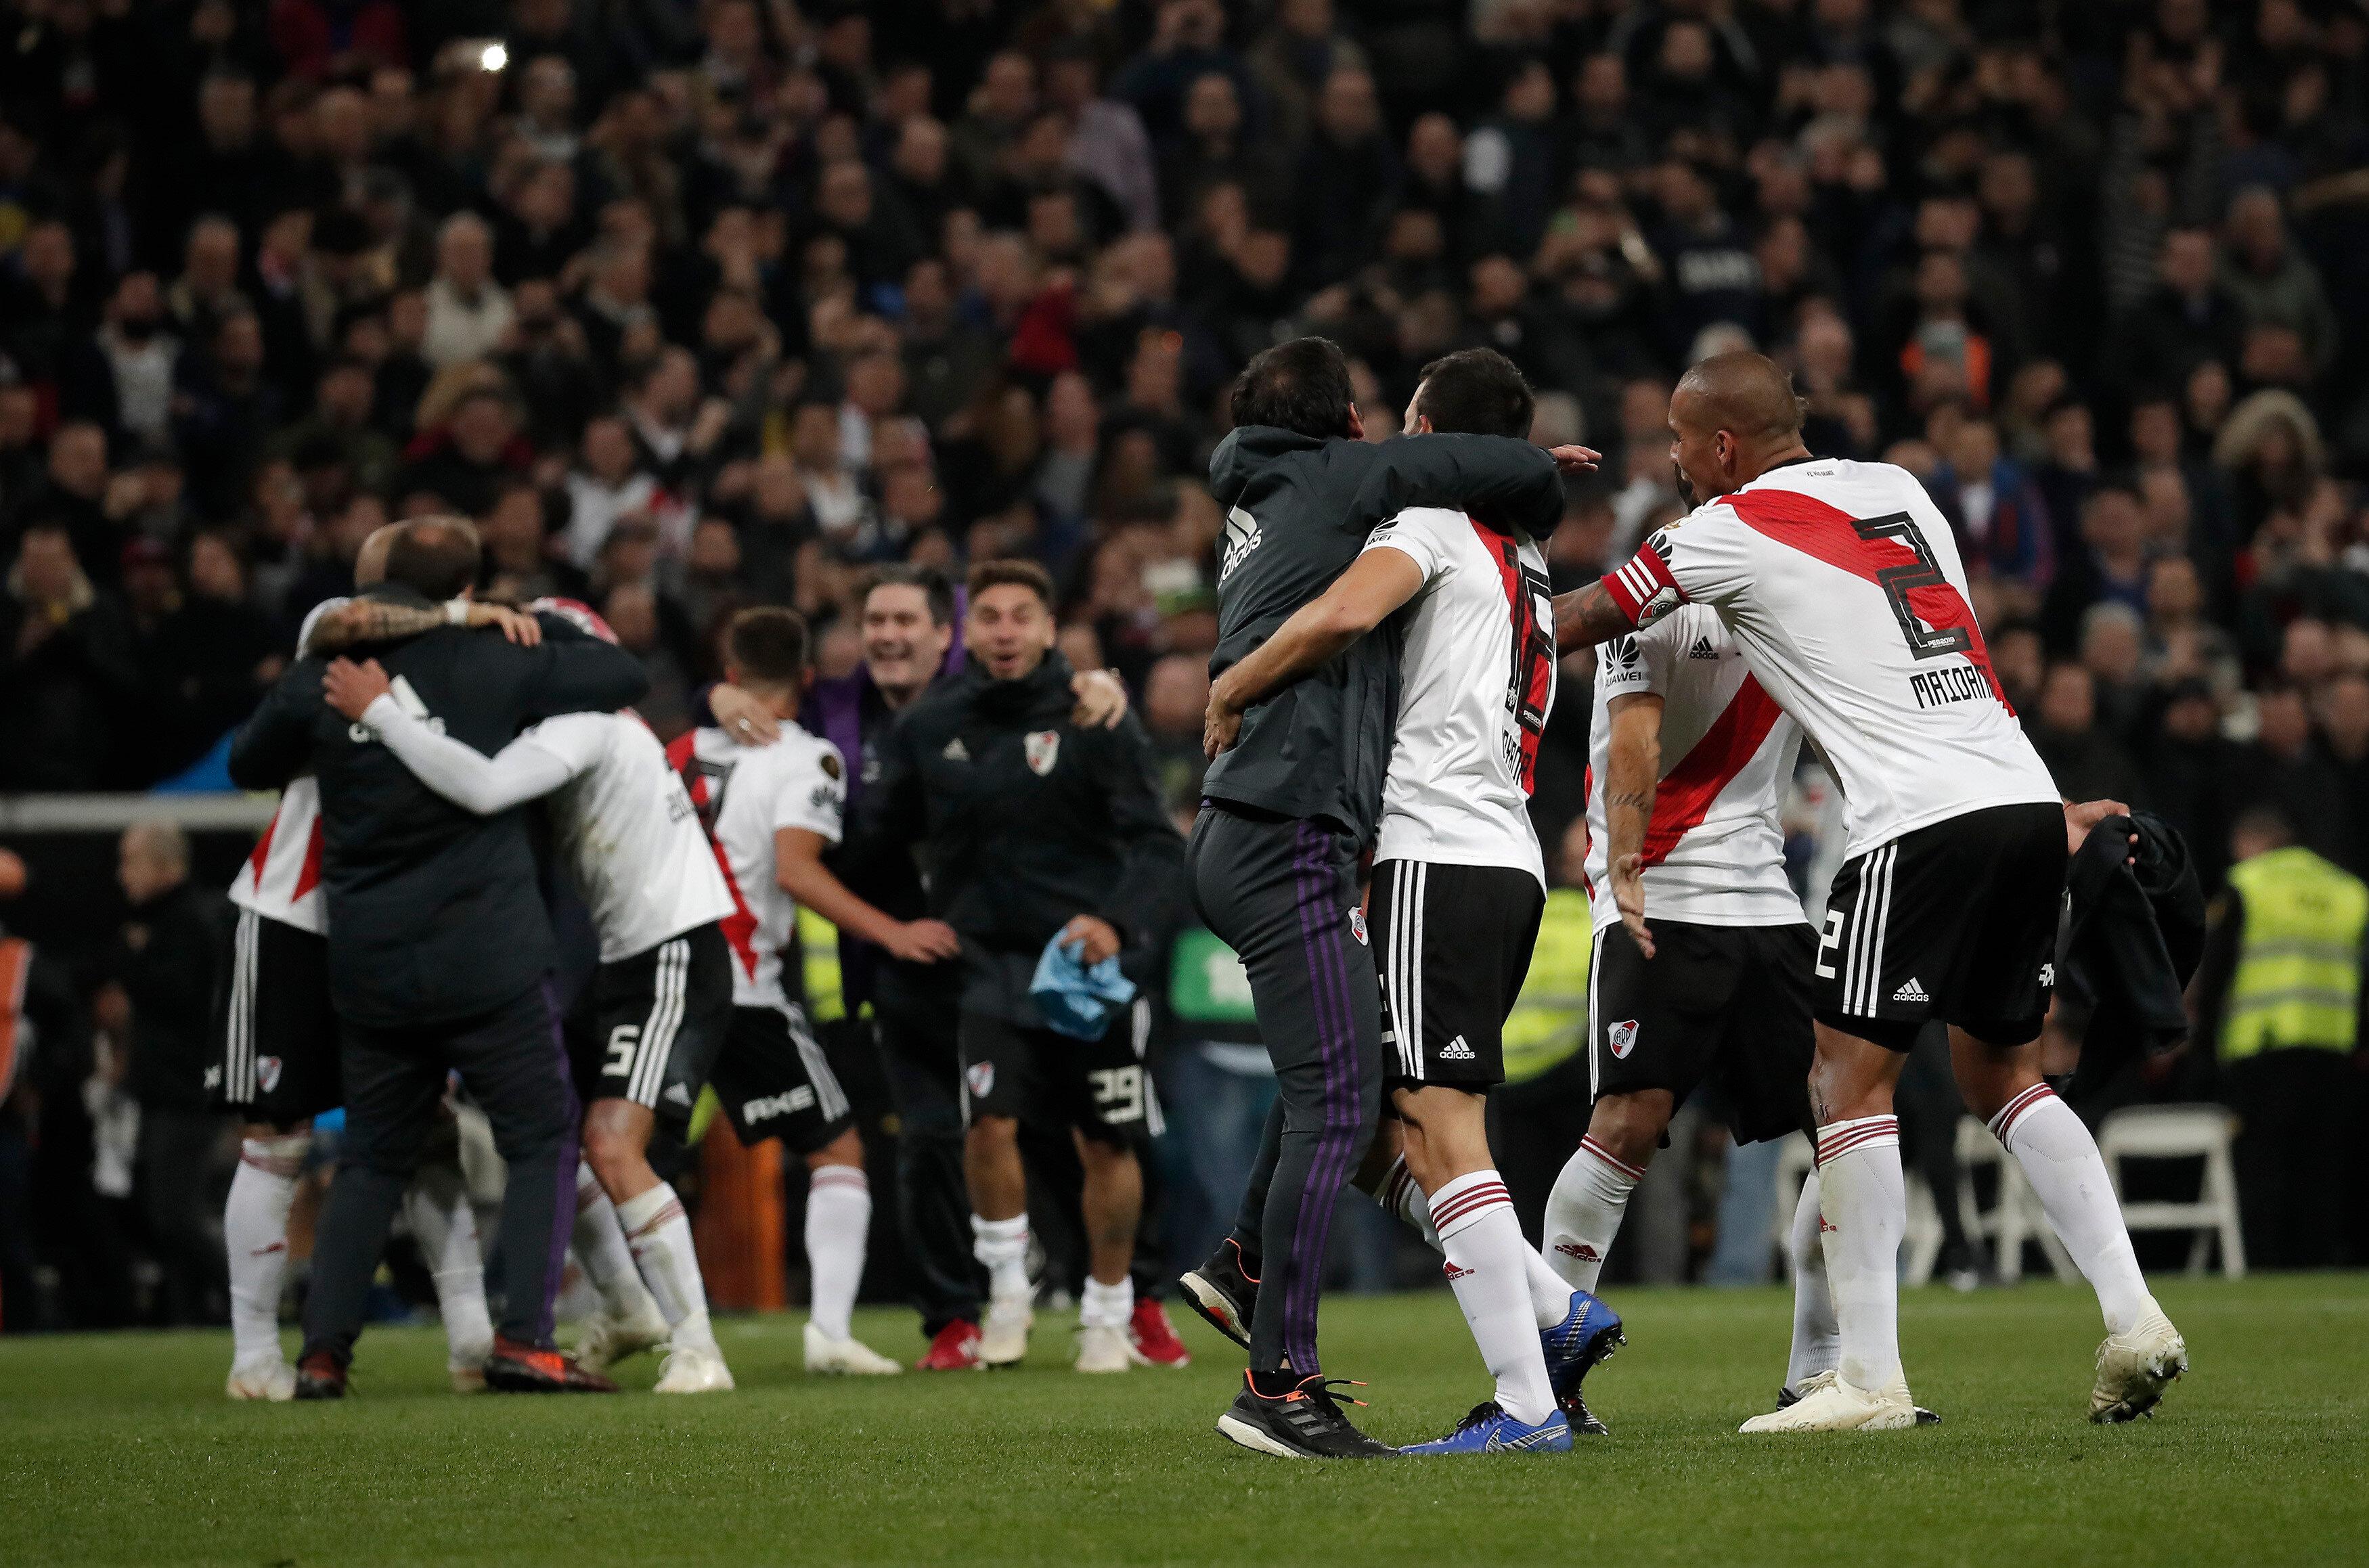 River Plate'li oyuncuların zafer sevinci.